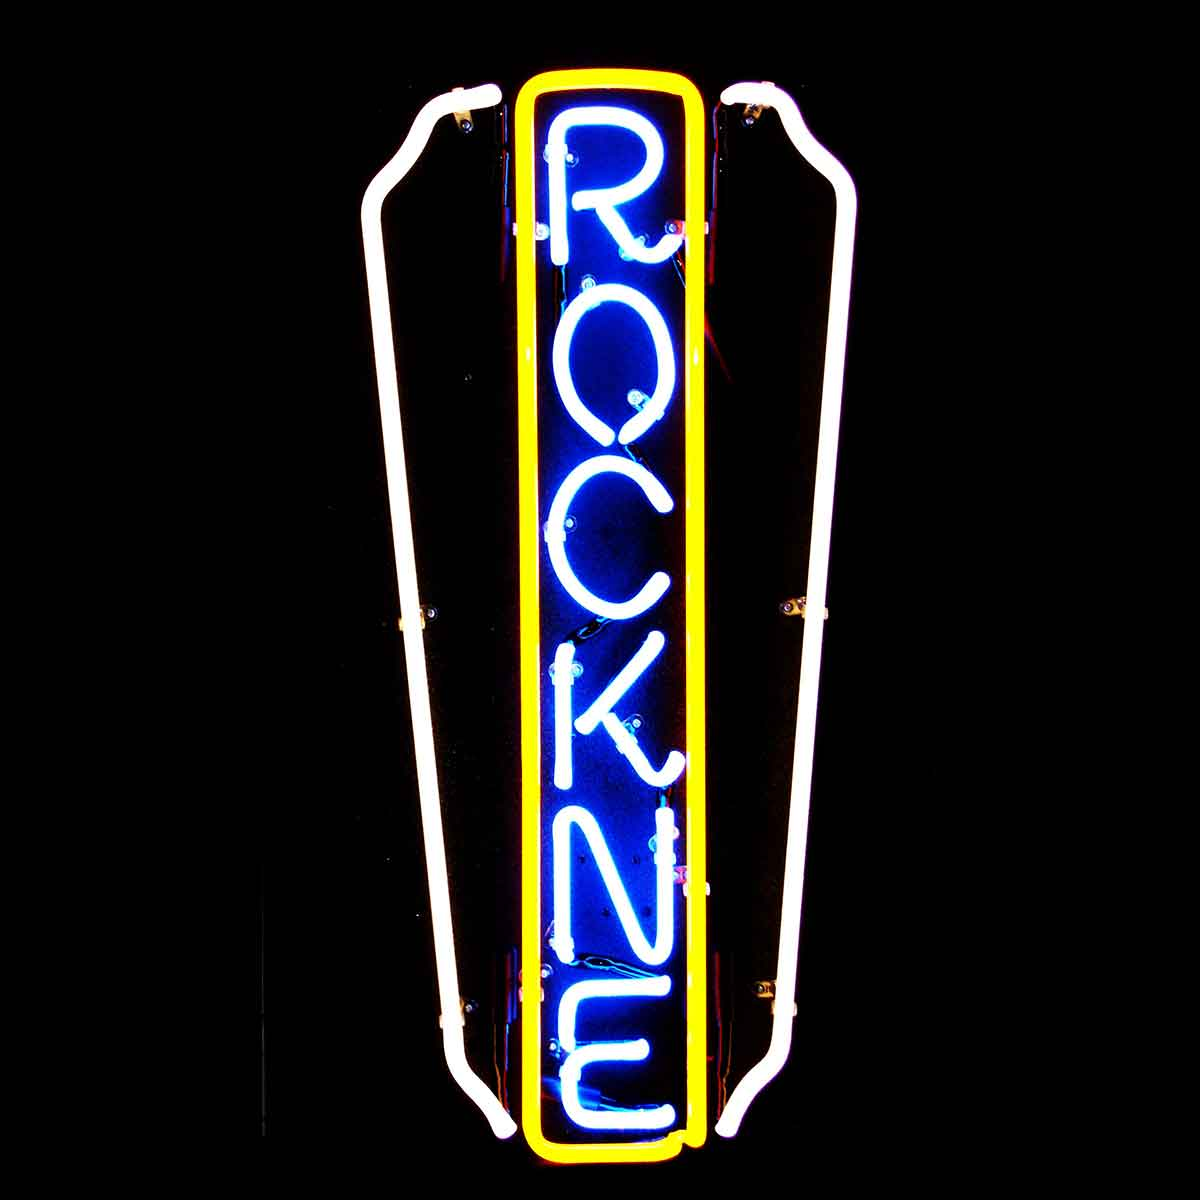 Rockne-1200x1200.jpg